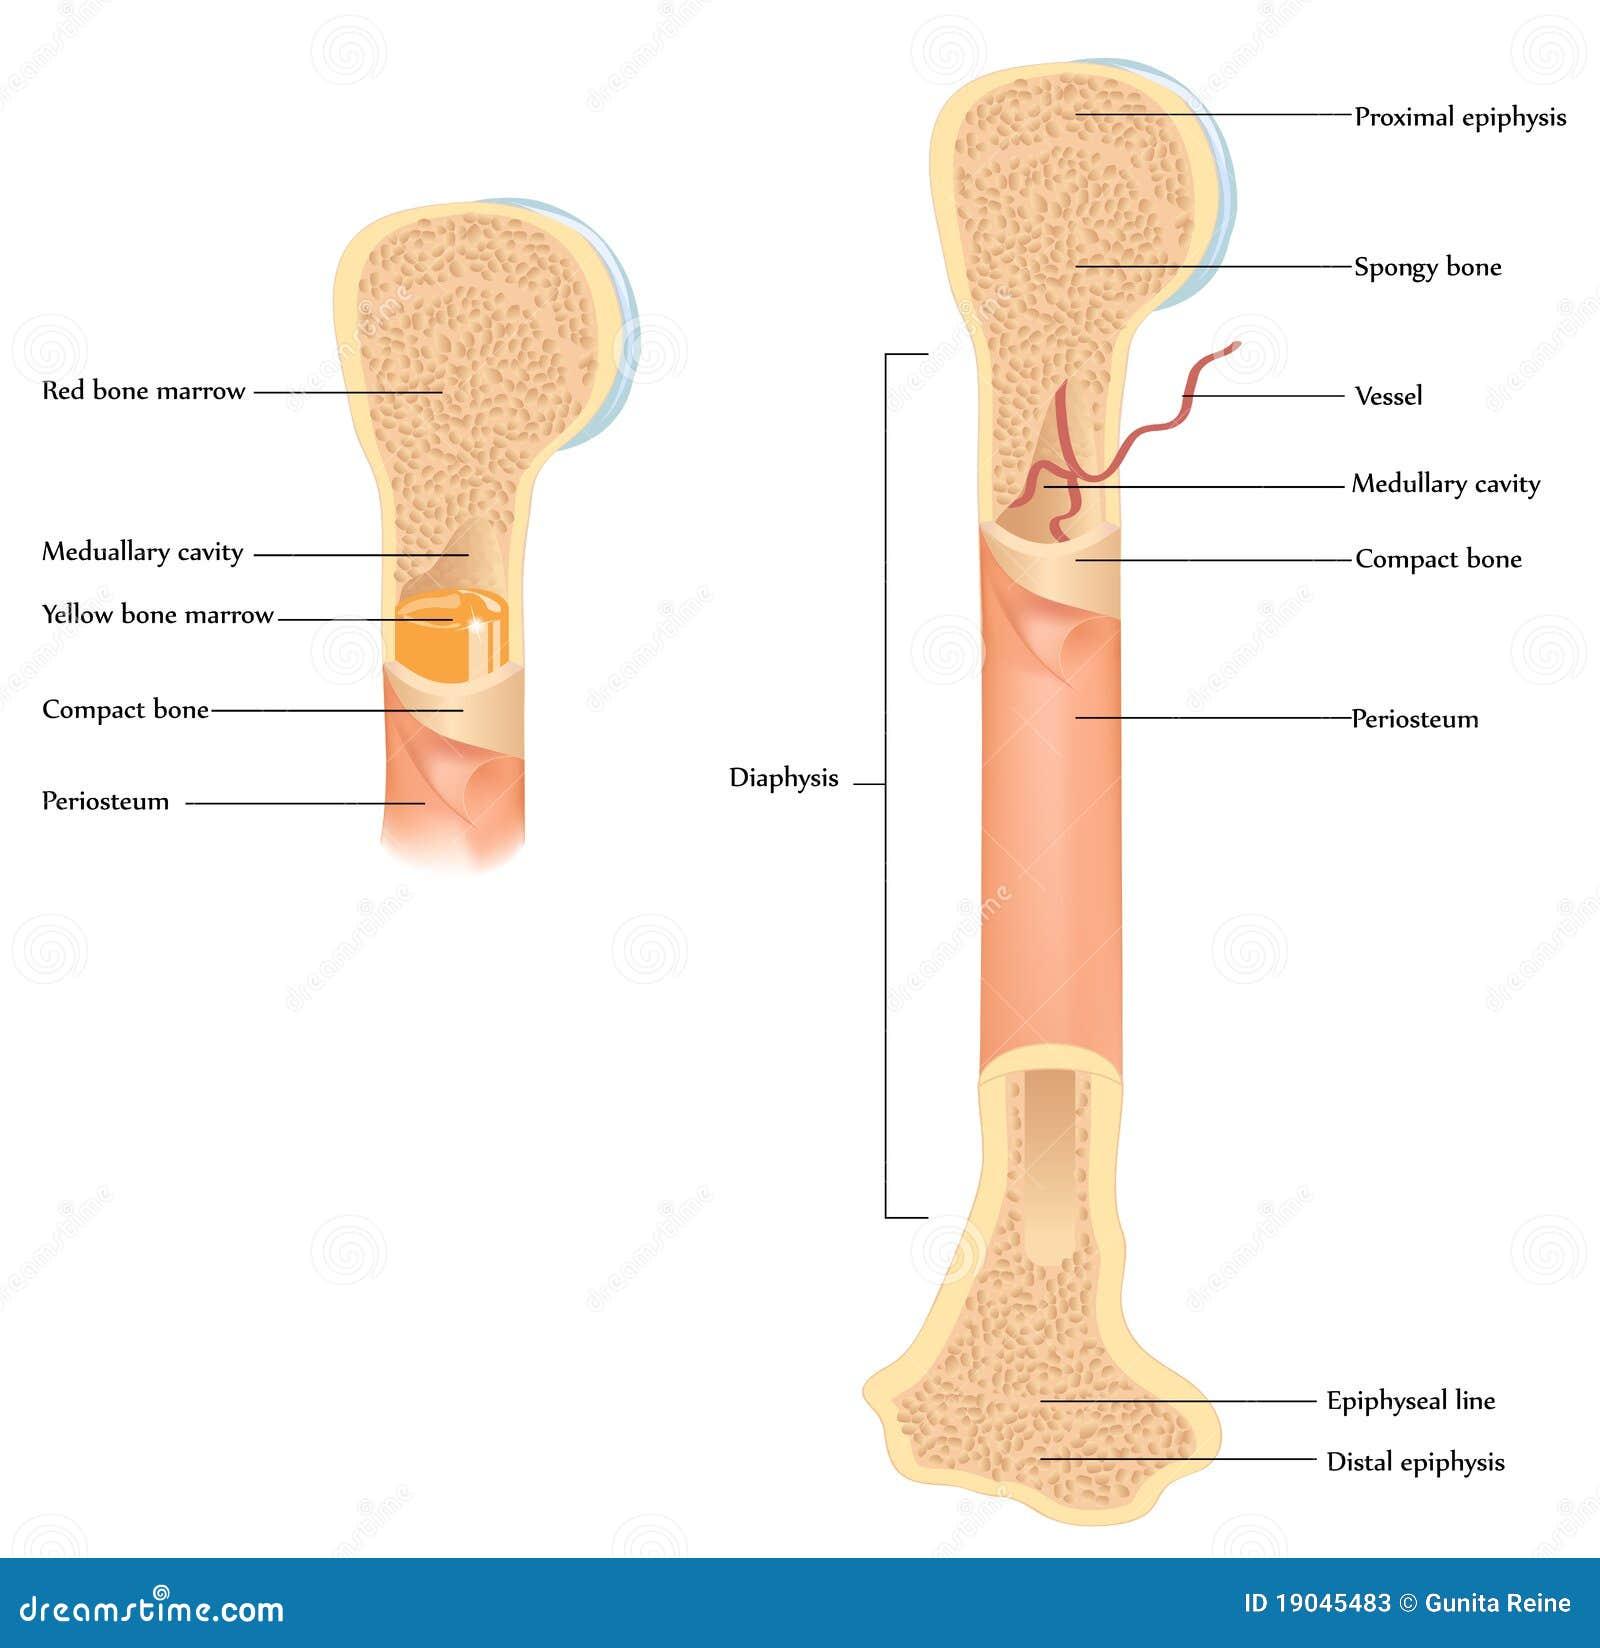 Human bone anatomy illustration showing detailed anatomy of human